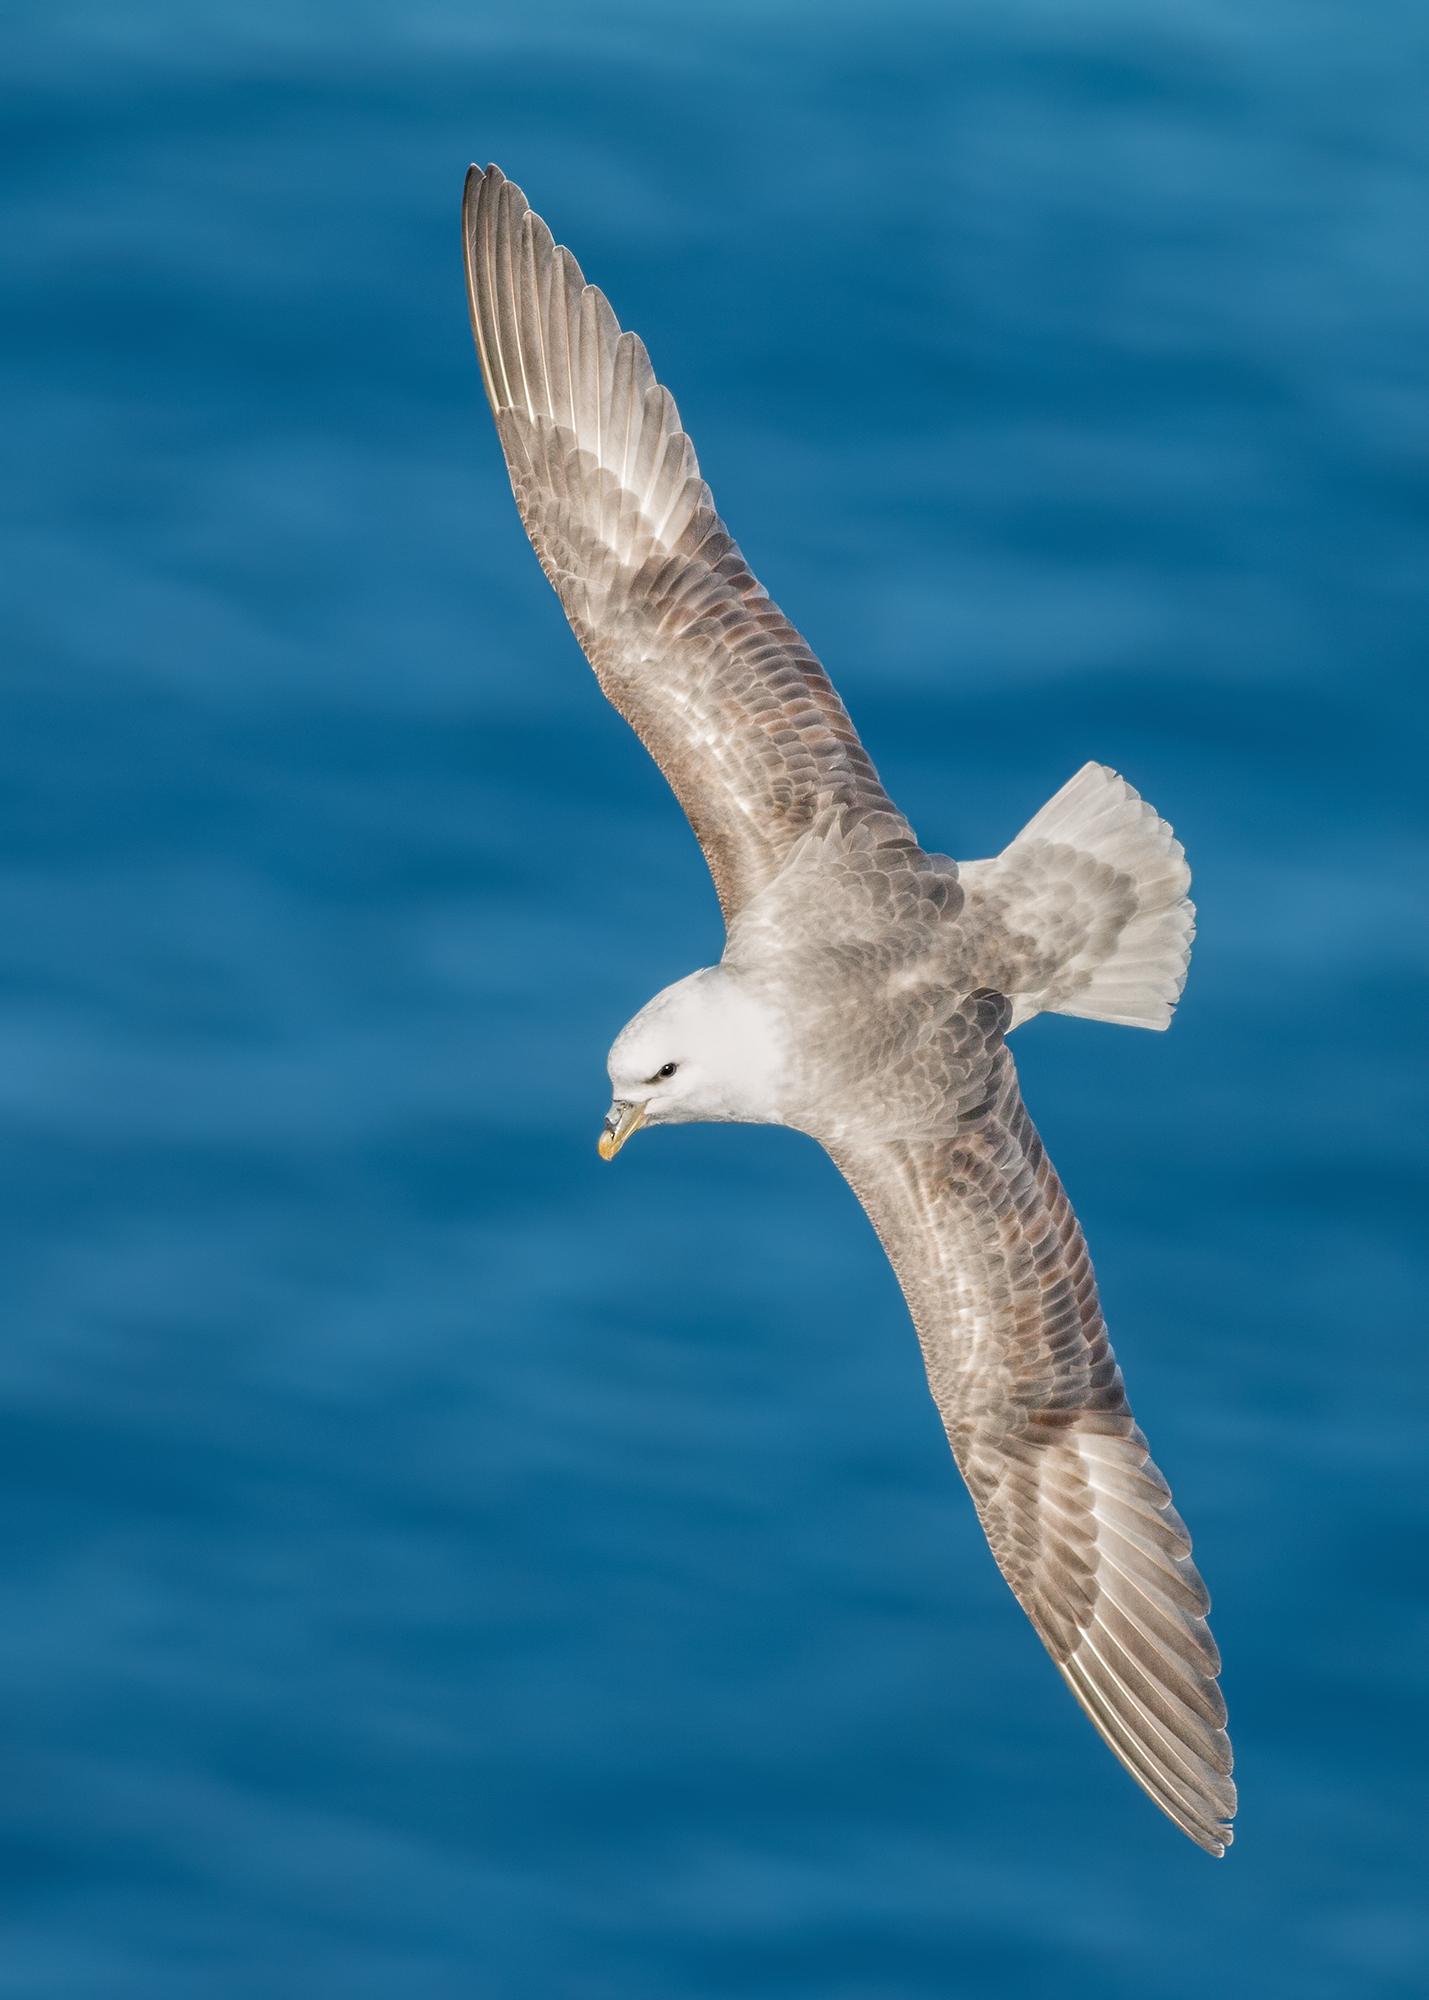 Stormfågel-JPEG_web 15.jpg